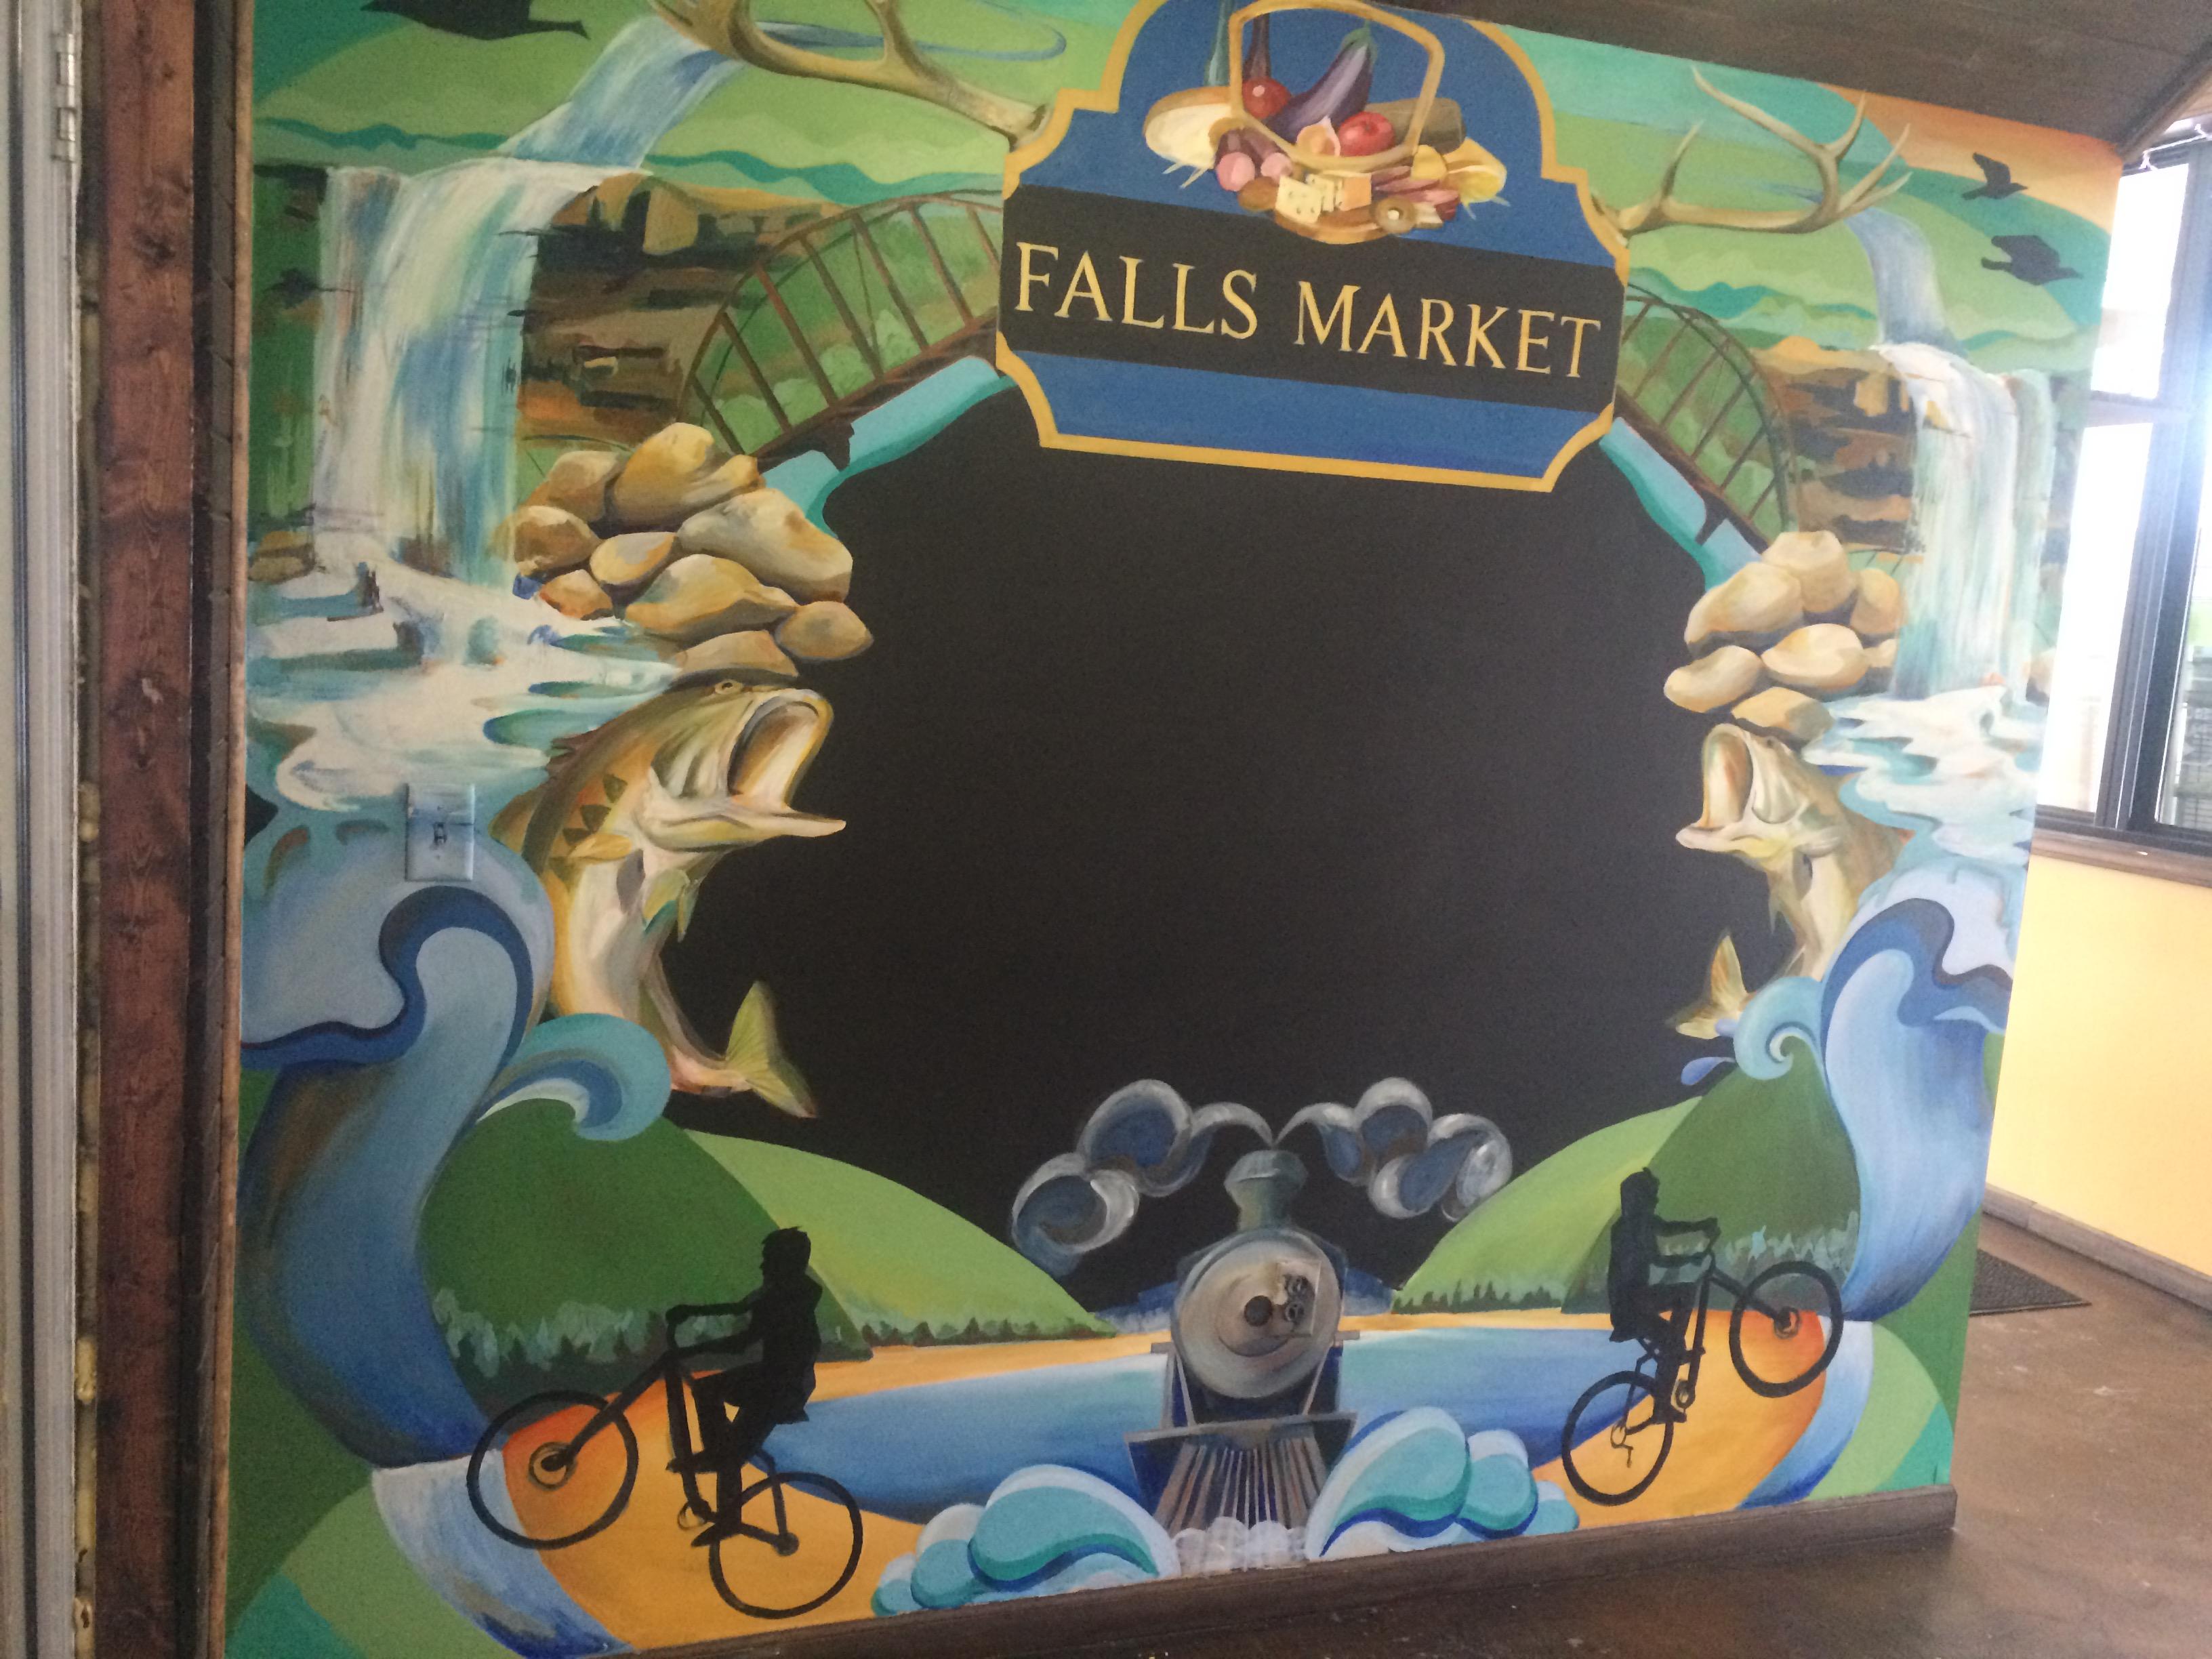 Falls market chalk board mural. Ohiopyle